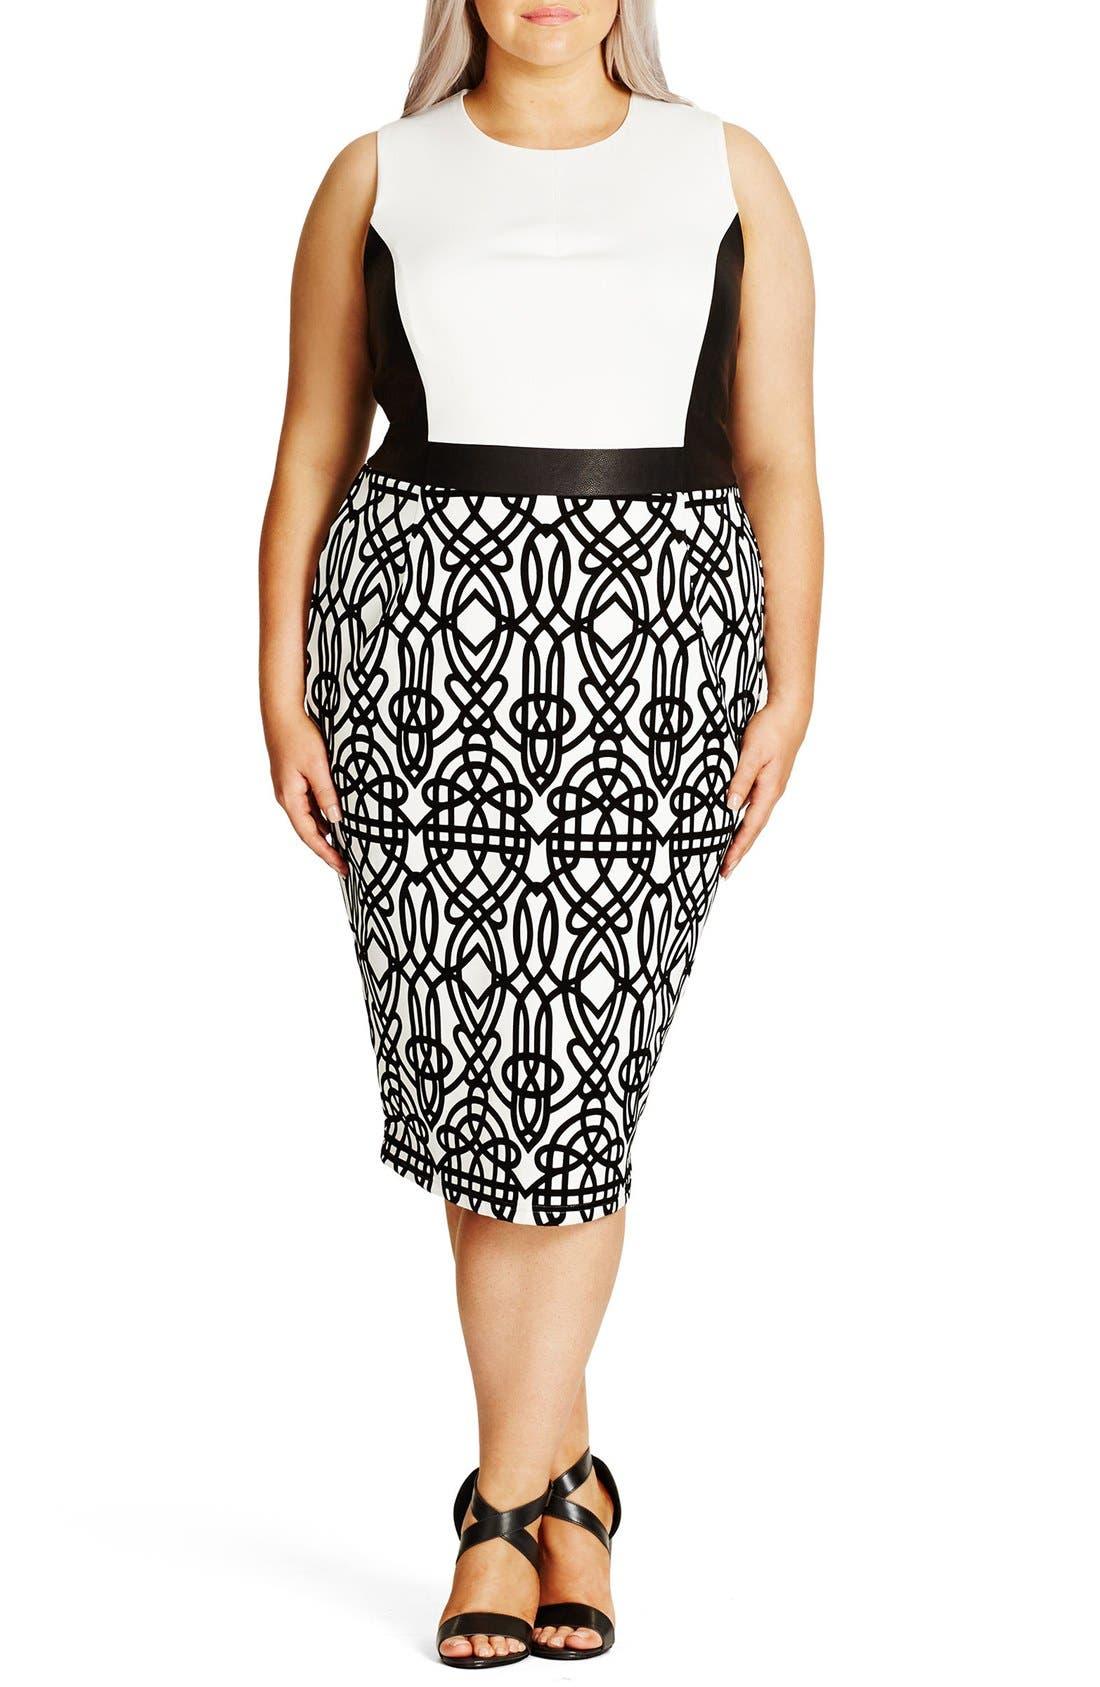 City Chic 'Art Deco' Print Block Sheath Dress (Plus Size)